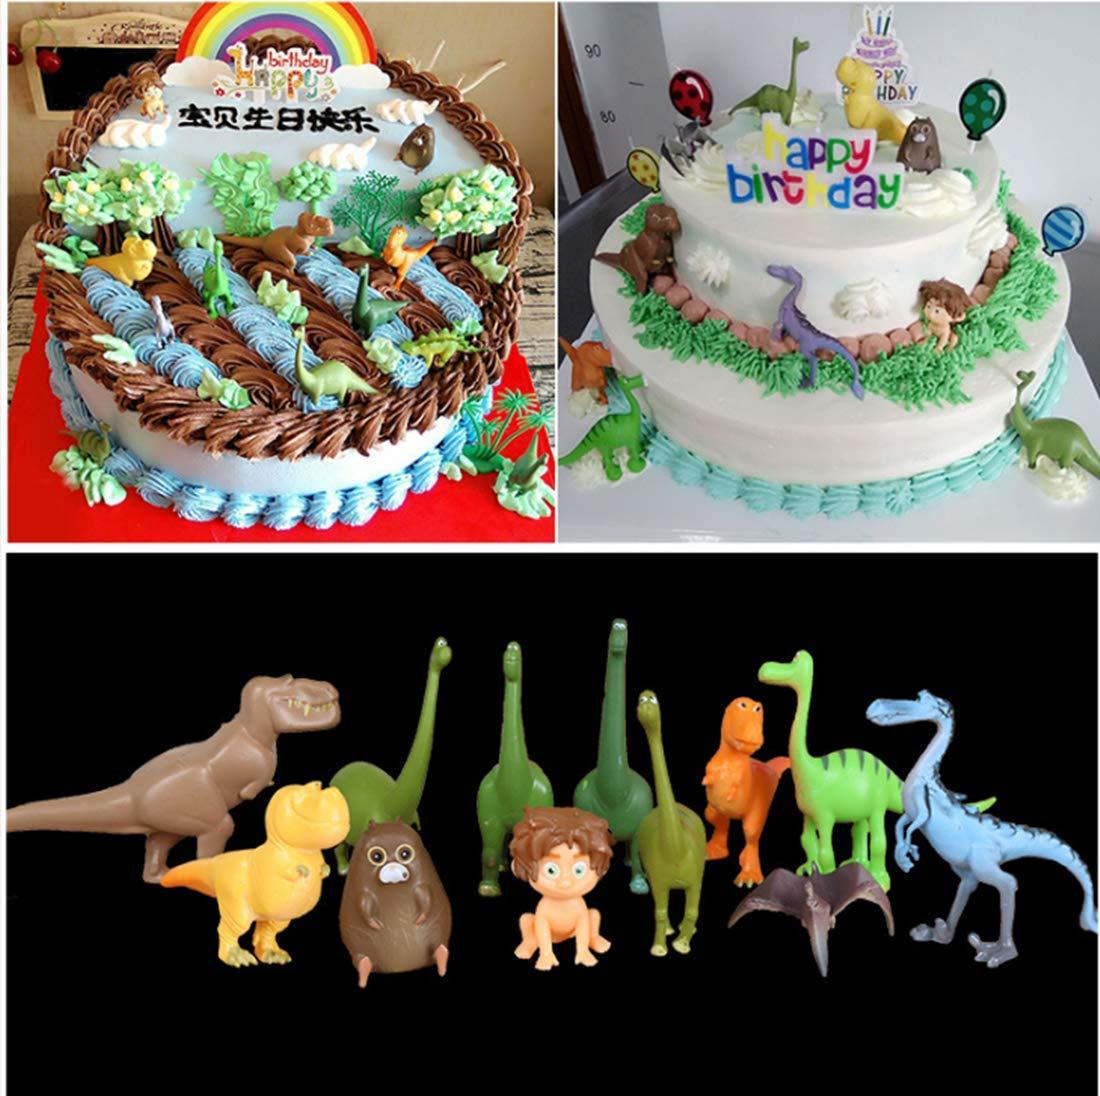 Cake Decoration Game Toy Party Collection Disney Pixar Dinosaur Mini Action Figures。12pcs Dinosaur Cake Topper Birthday Party Supplies